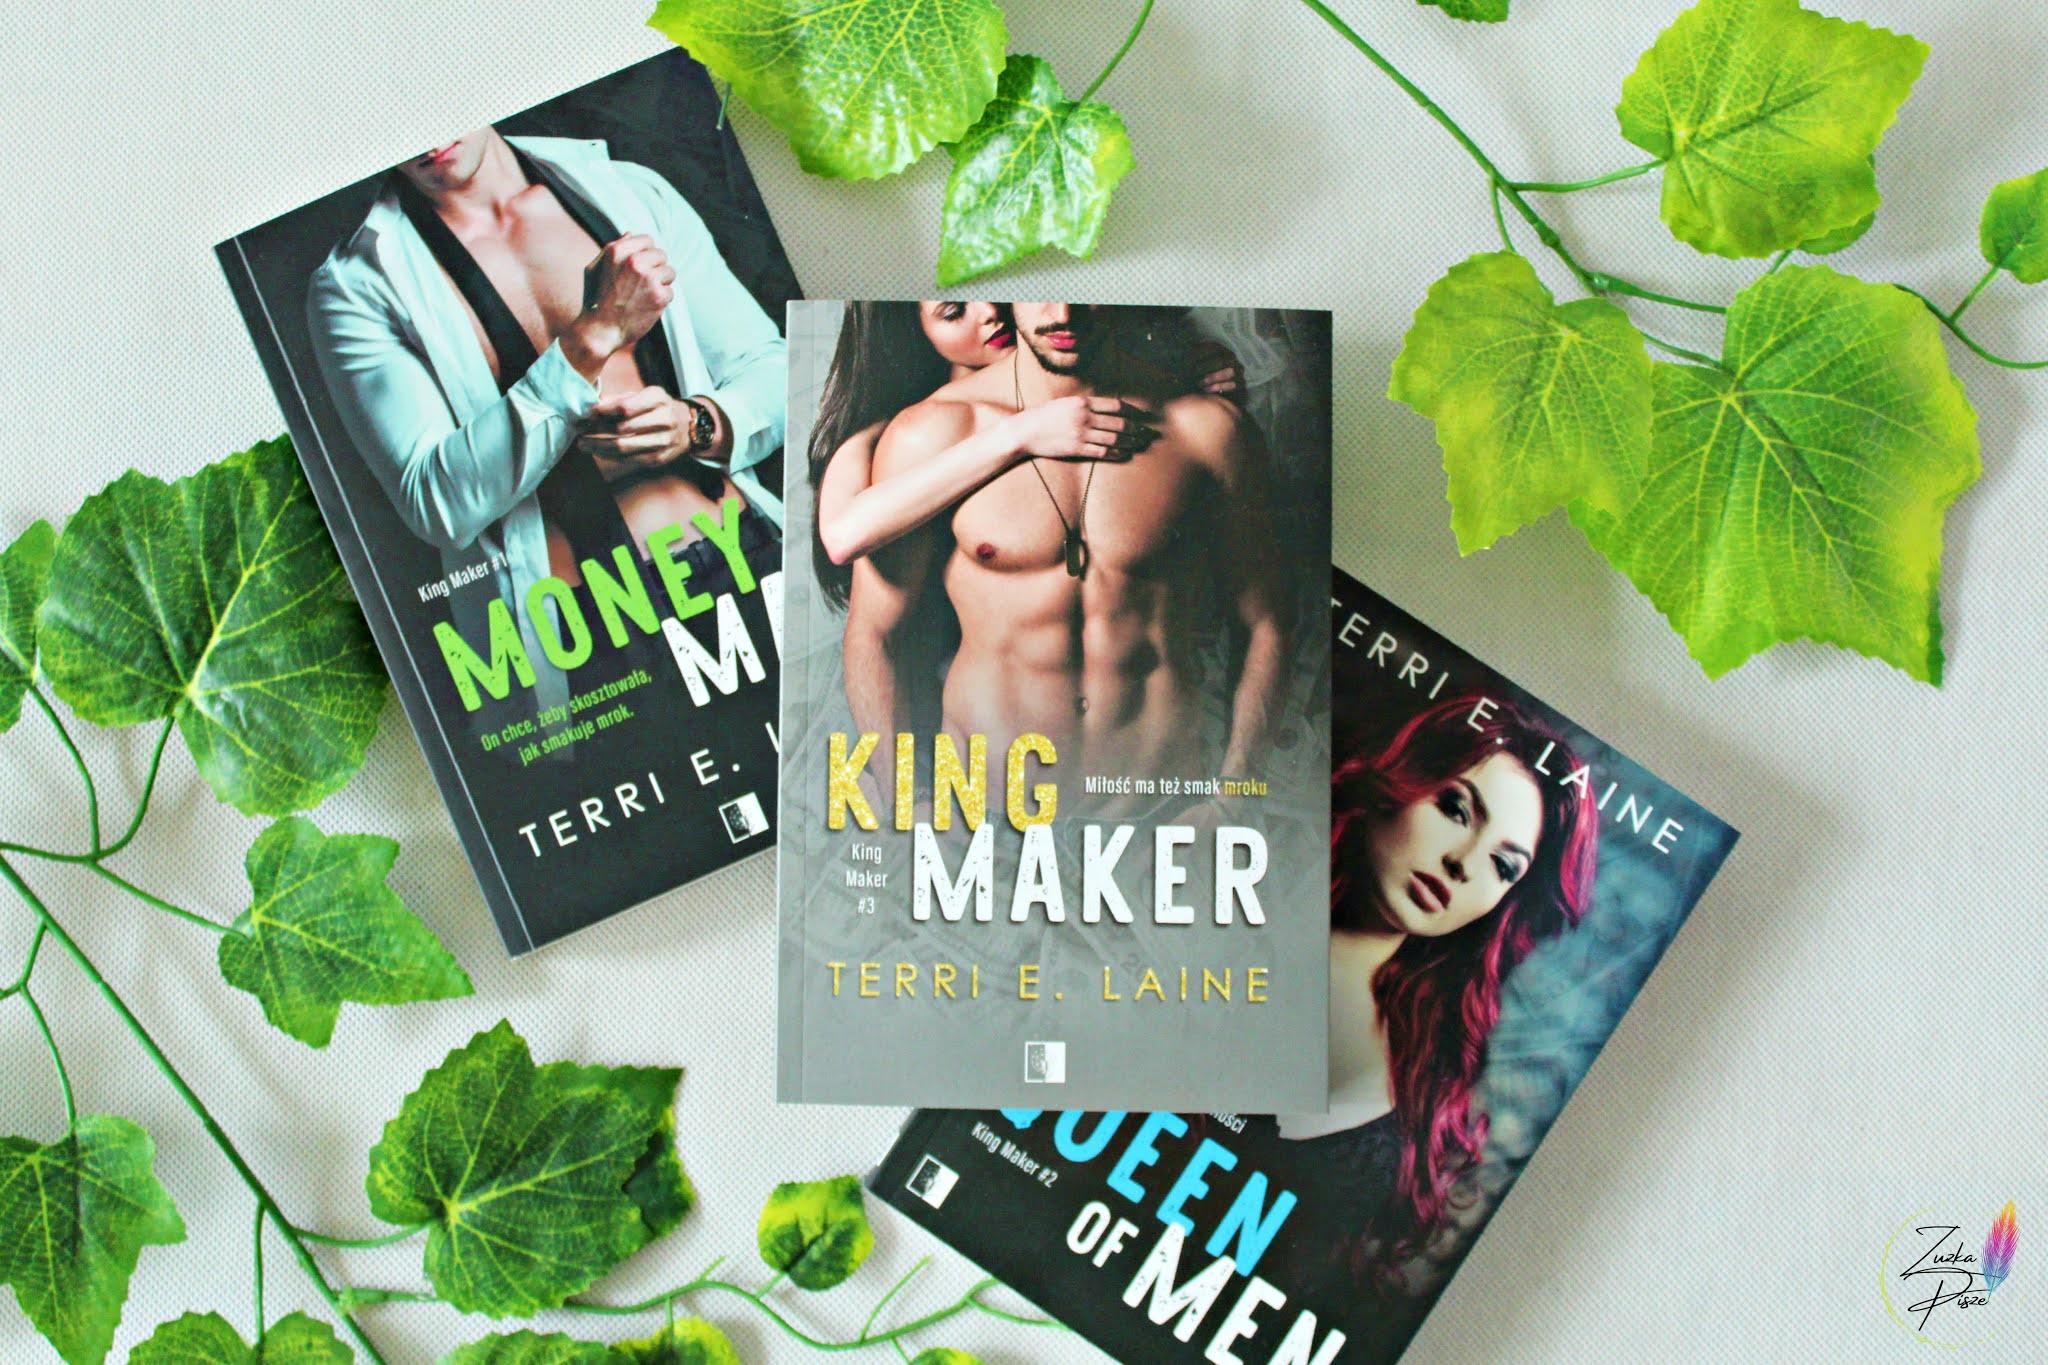 "Terri E. Laine ""King Maker"" - patronacka recenzja książki"